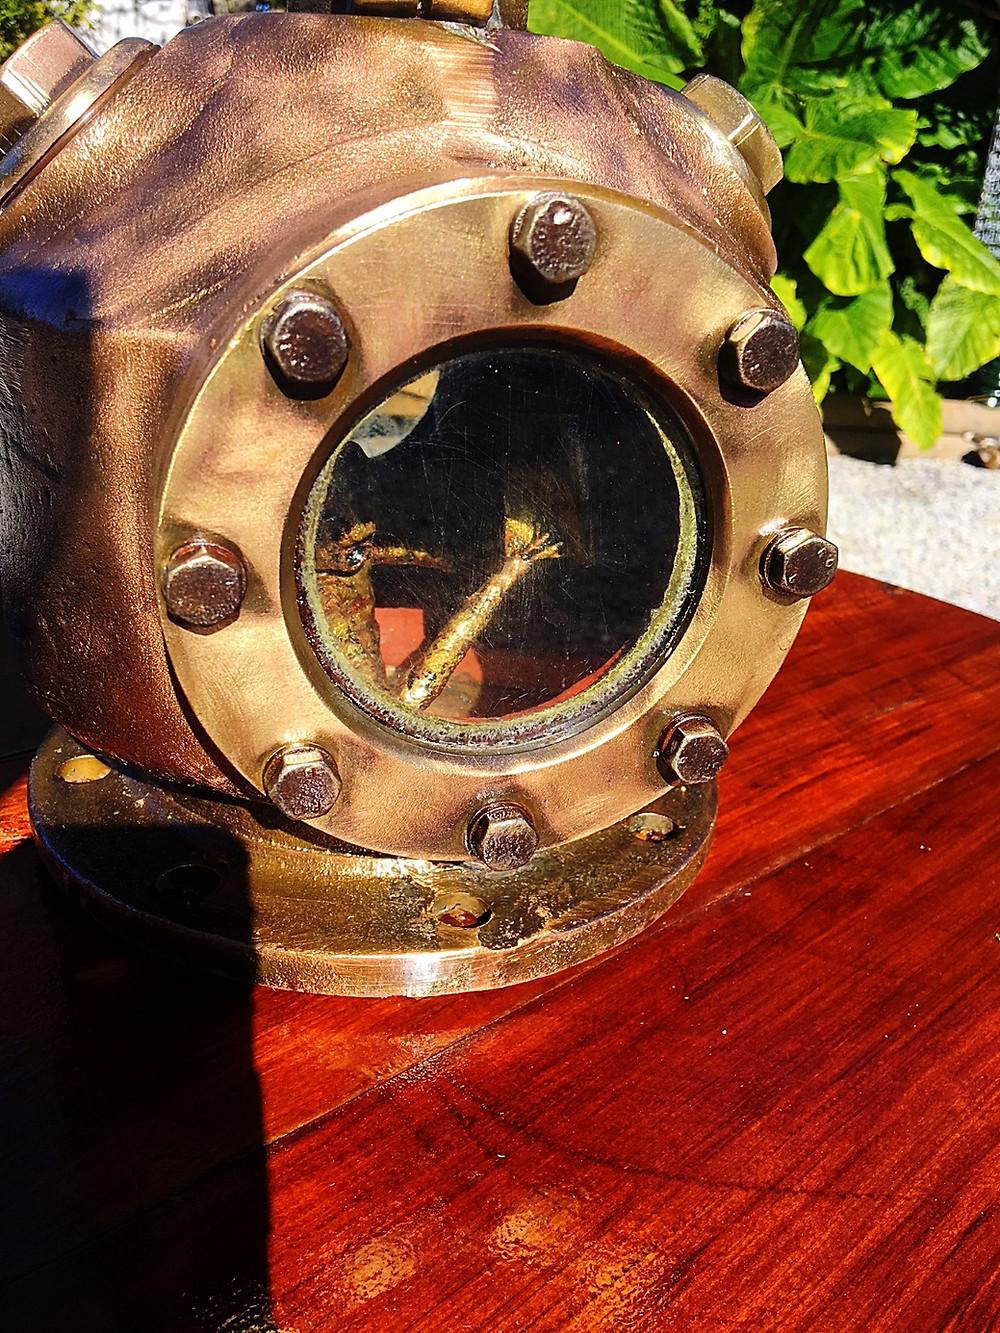 man inside diving helmet